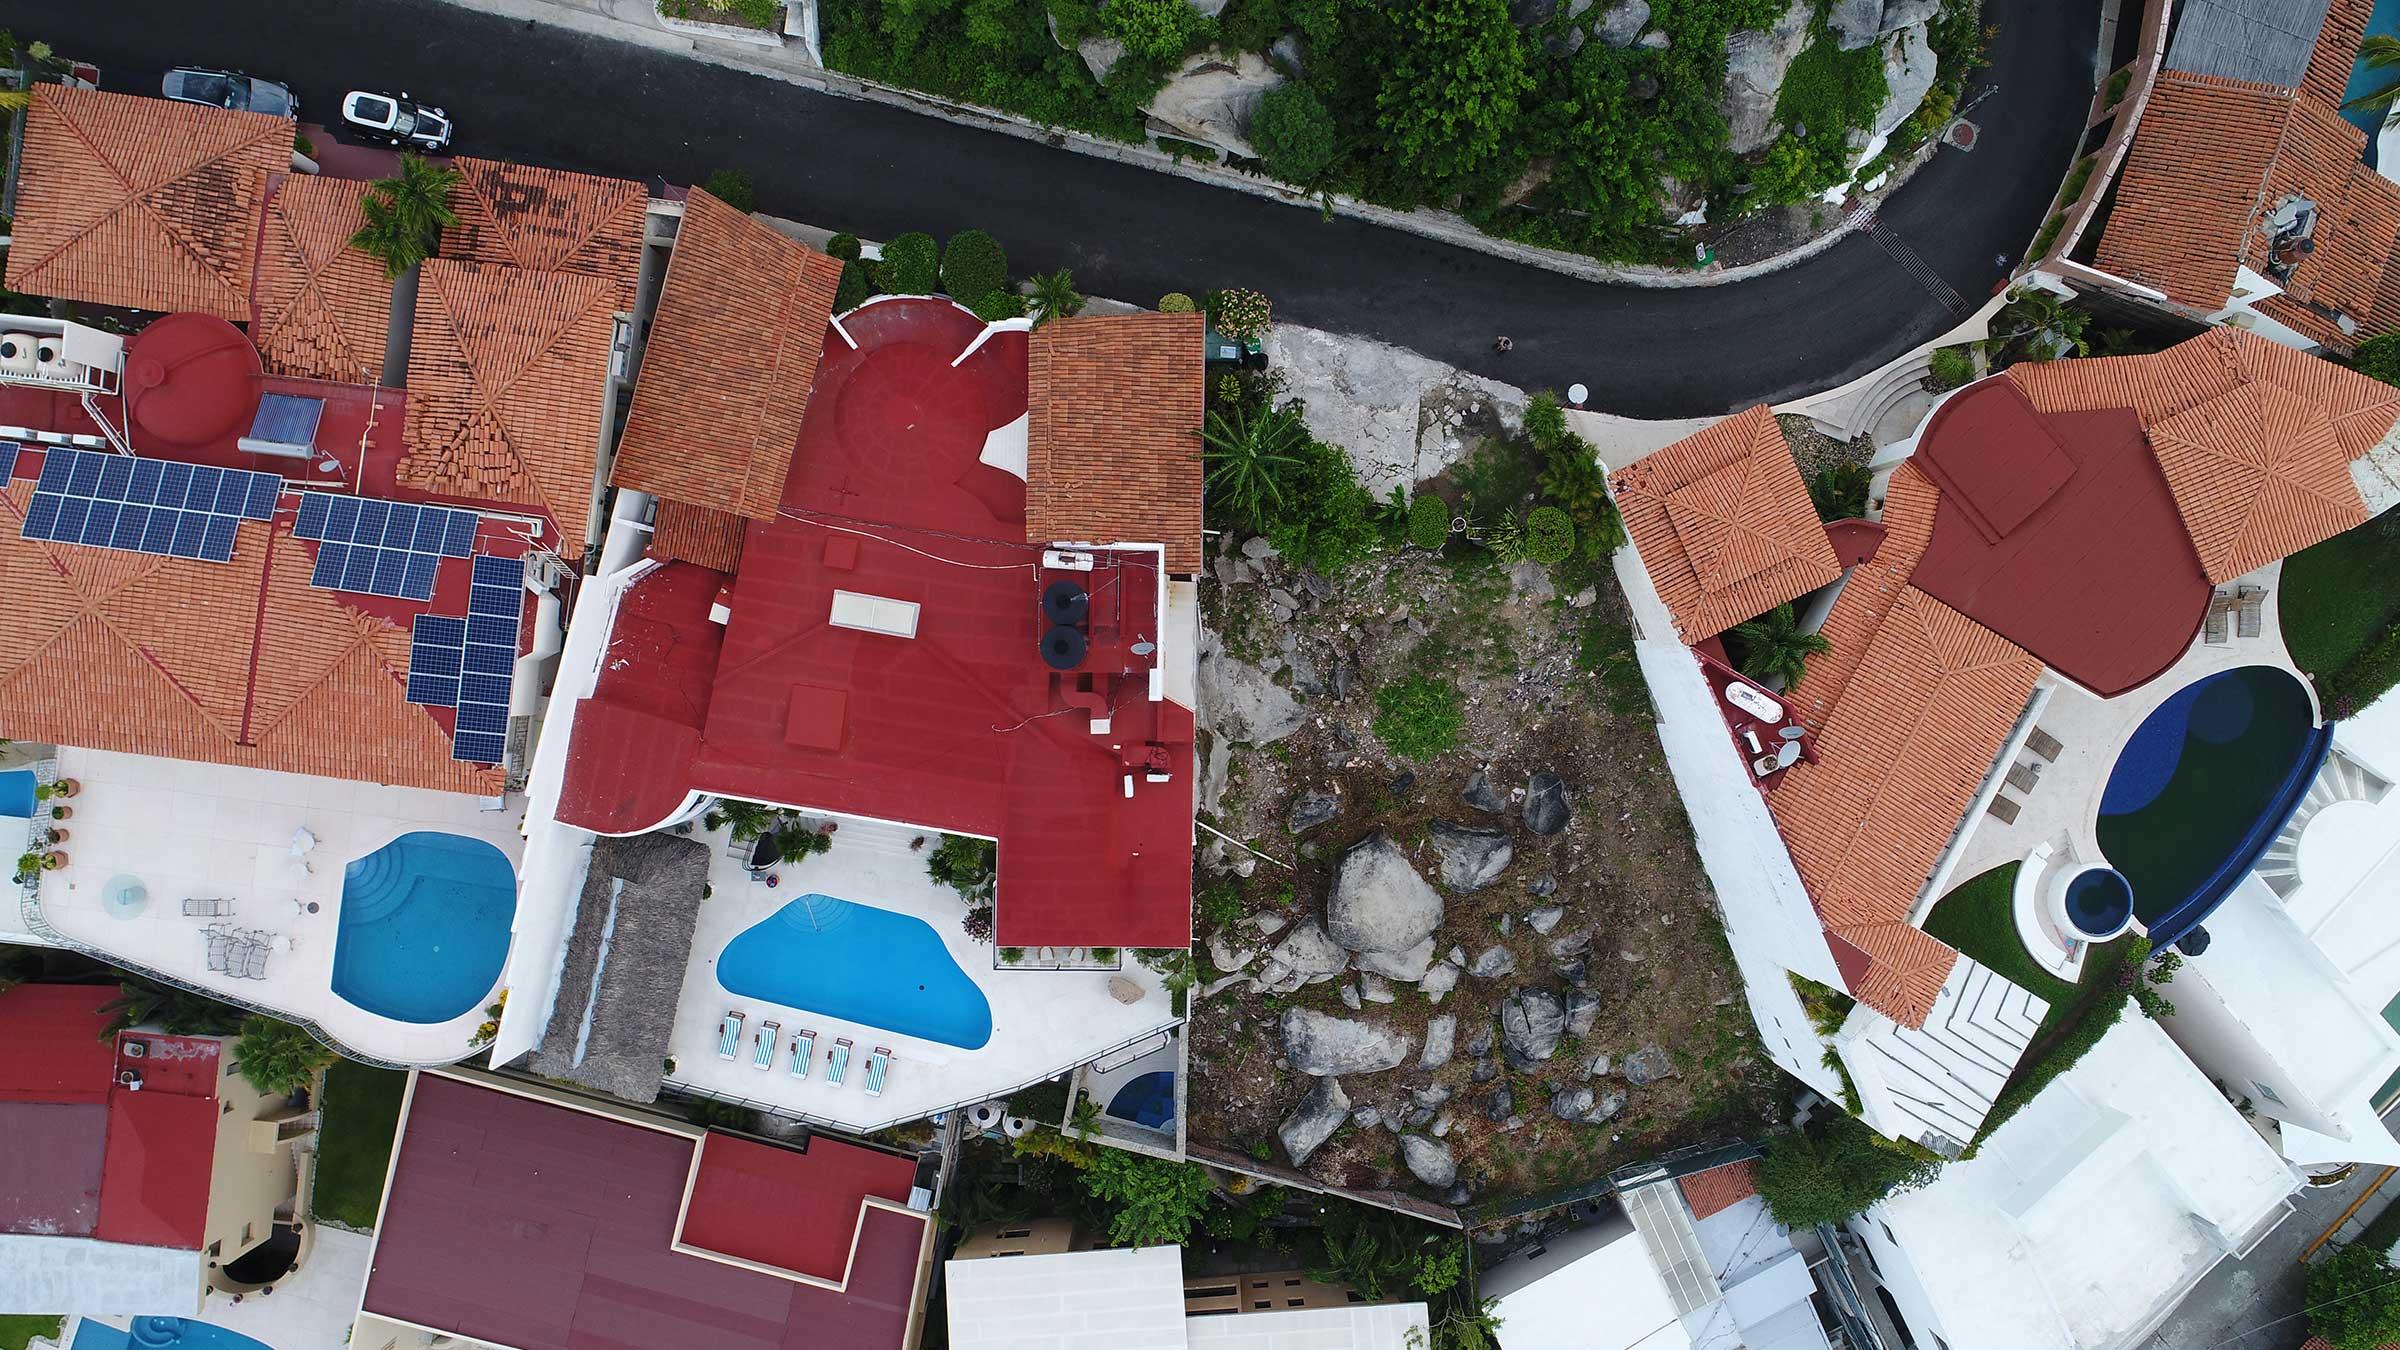 Vista aerea de Casa Buenos Aires, Acapulco